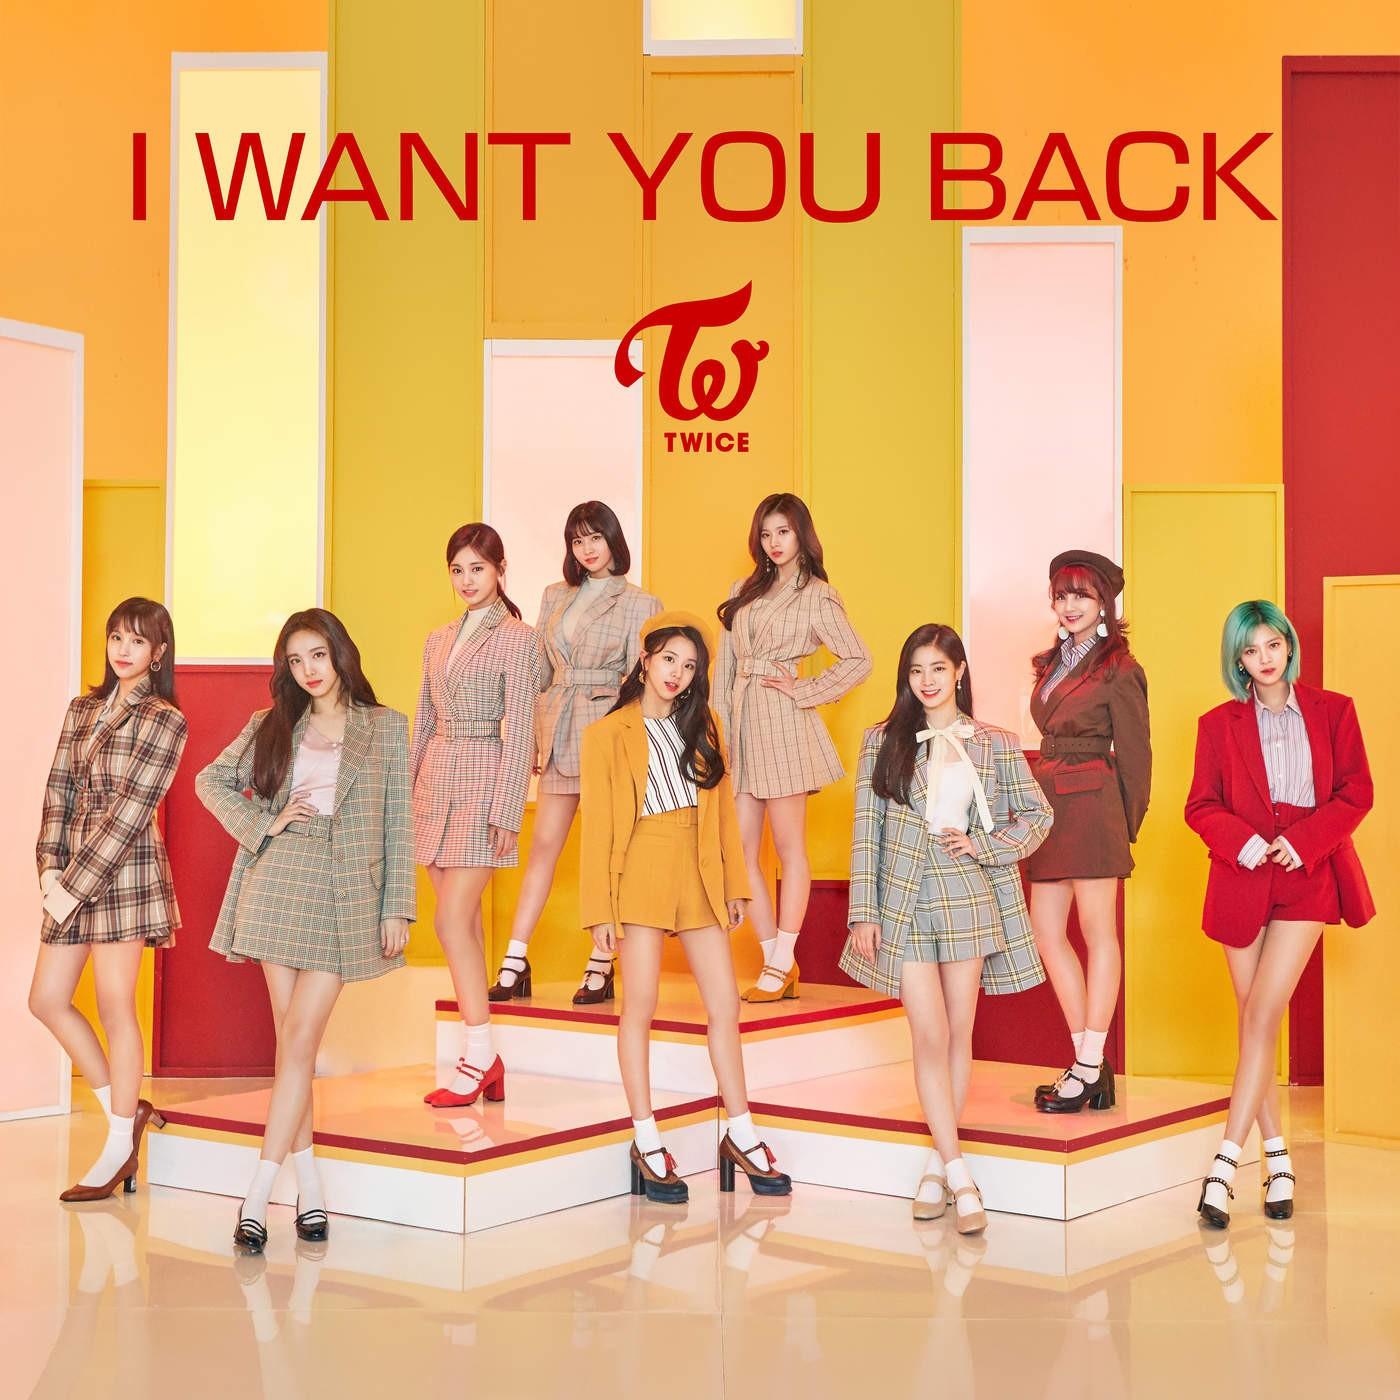 TWICE (트와이스) – I WANT YOU BACK [FLAC + MP3 320 / WEB] [2018.06.15]